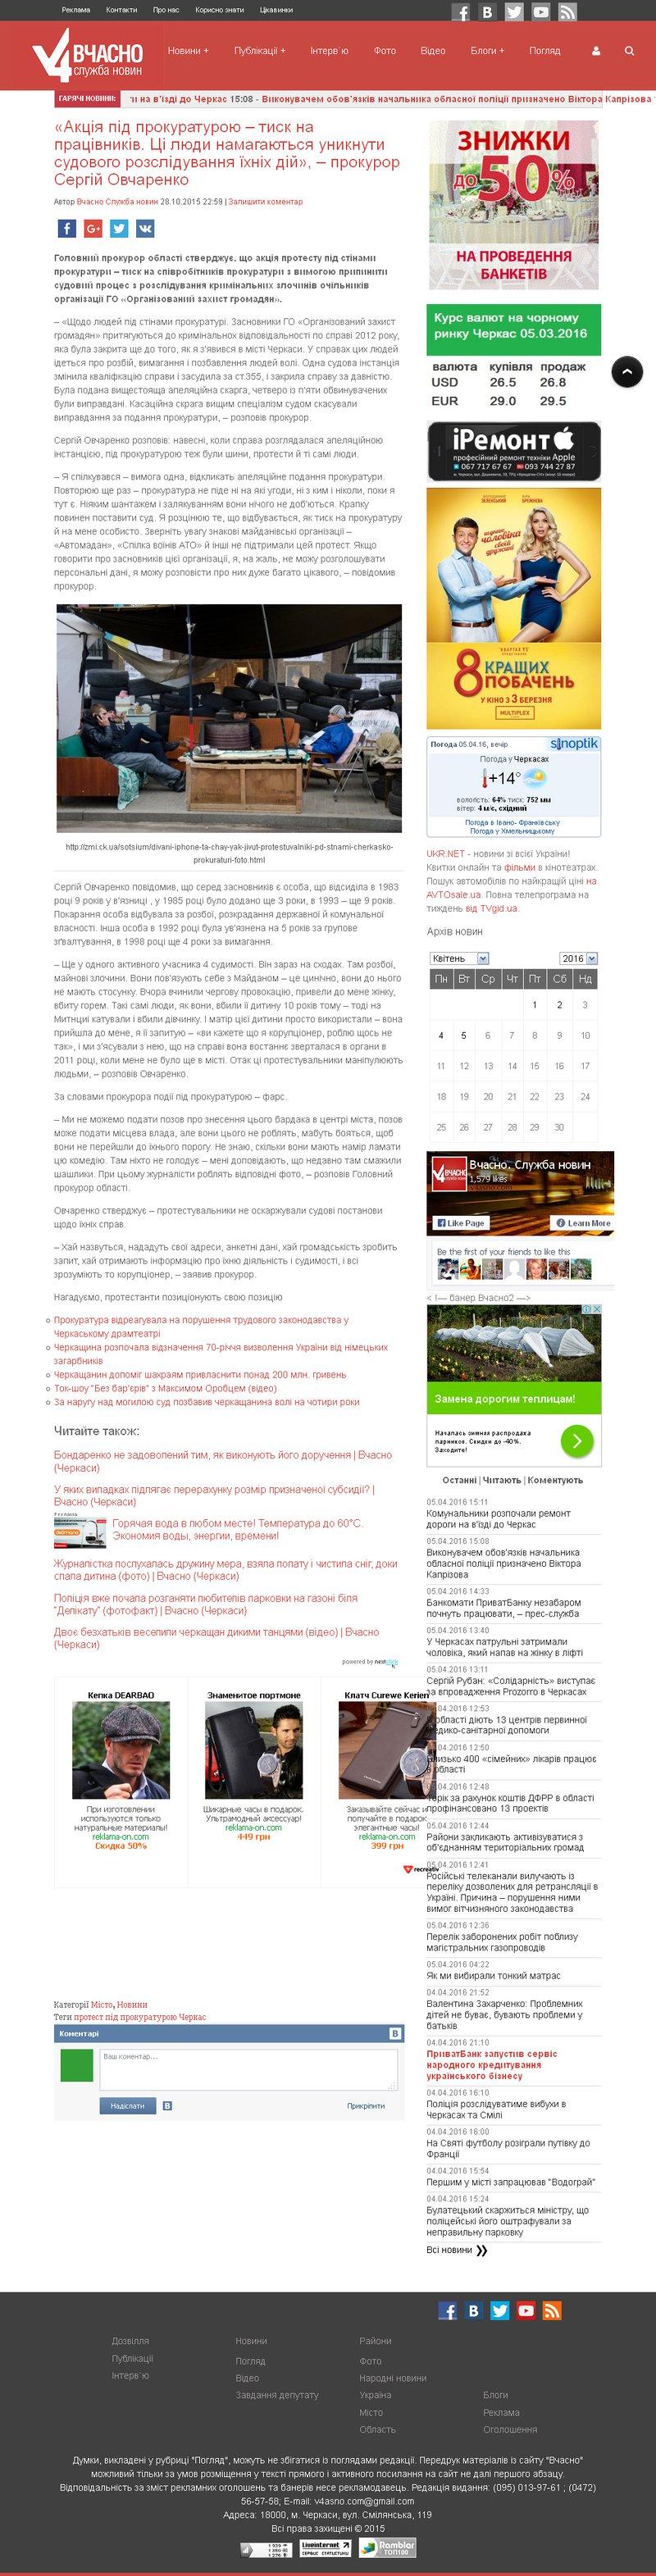 Новость о акции протеста – work in freelancer's portfolio